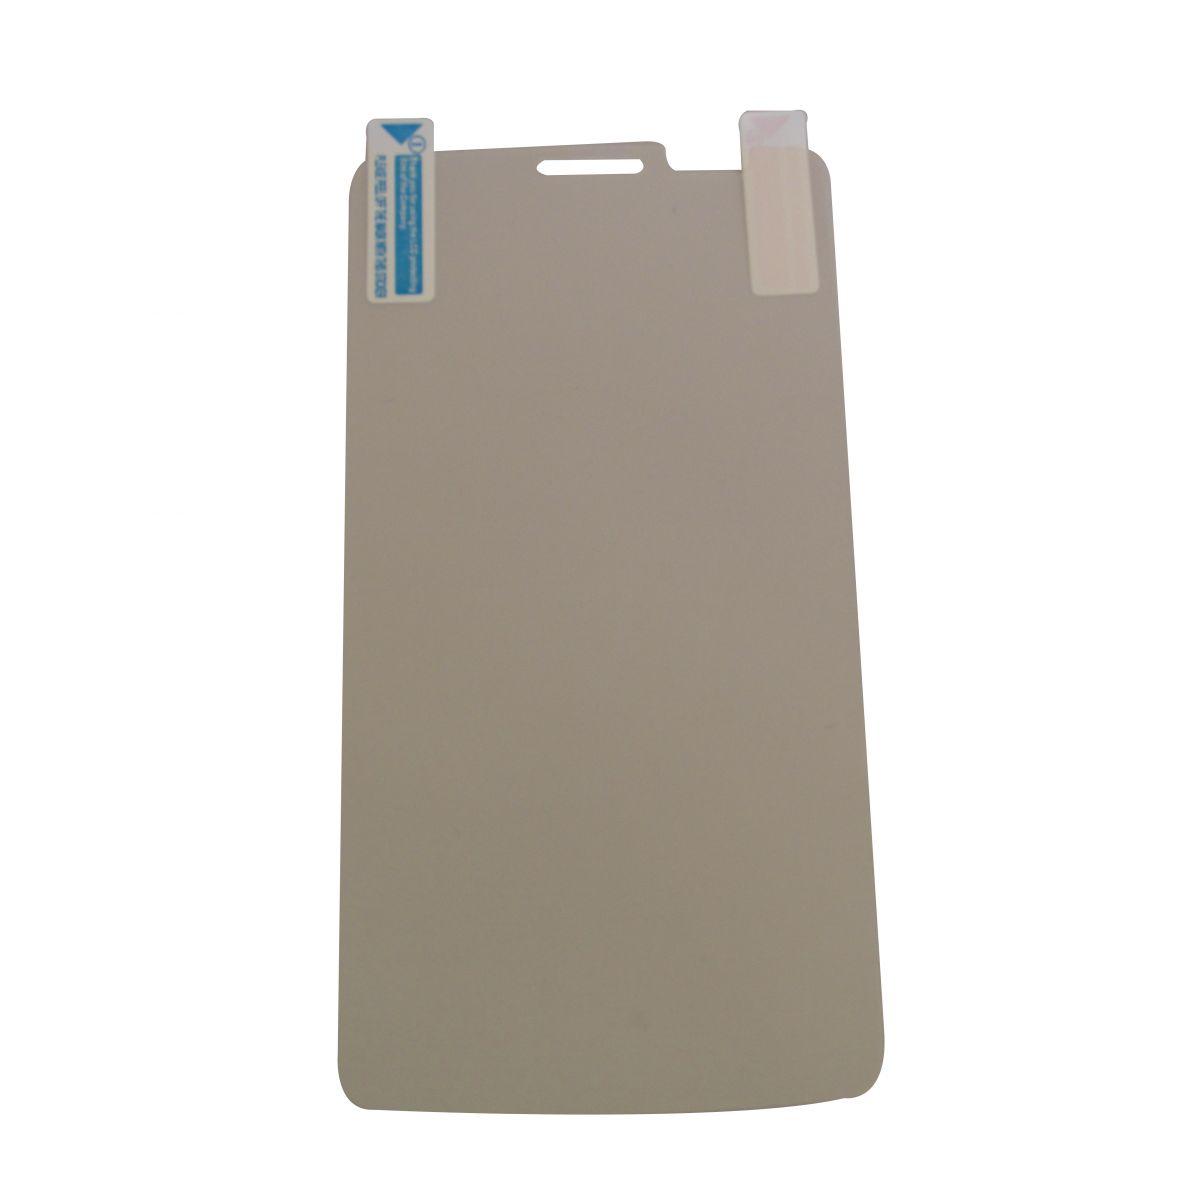 Pelicula Protetora Lg G3 Stylus D690 Fosca